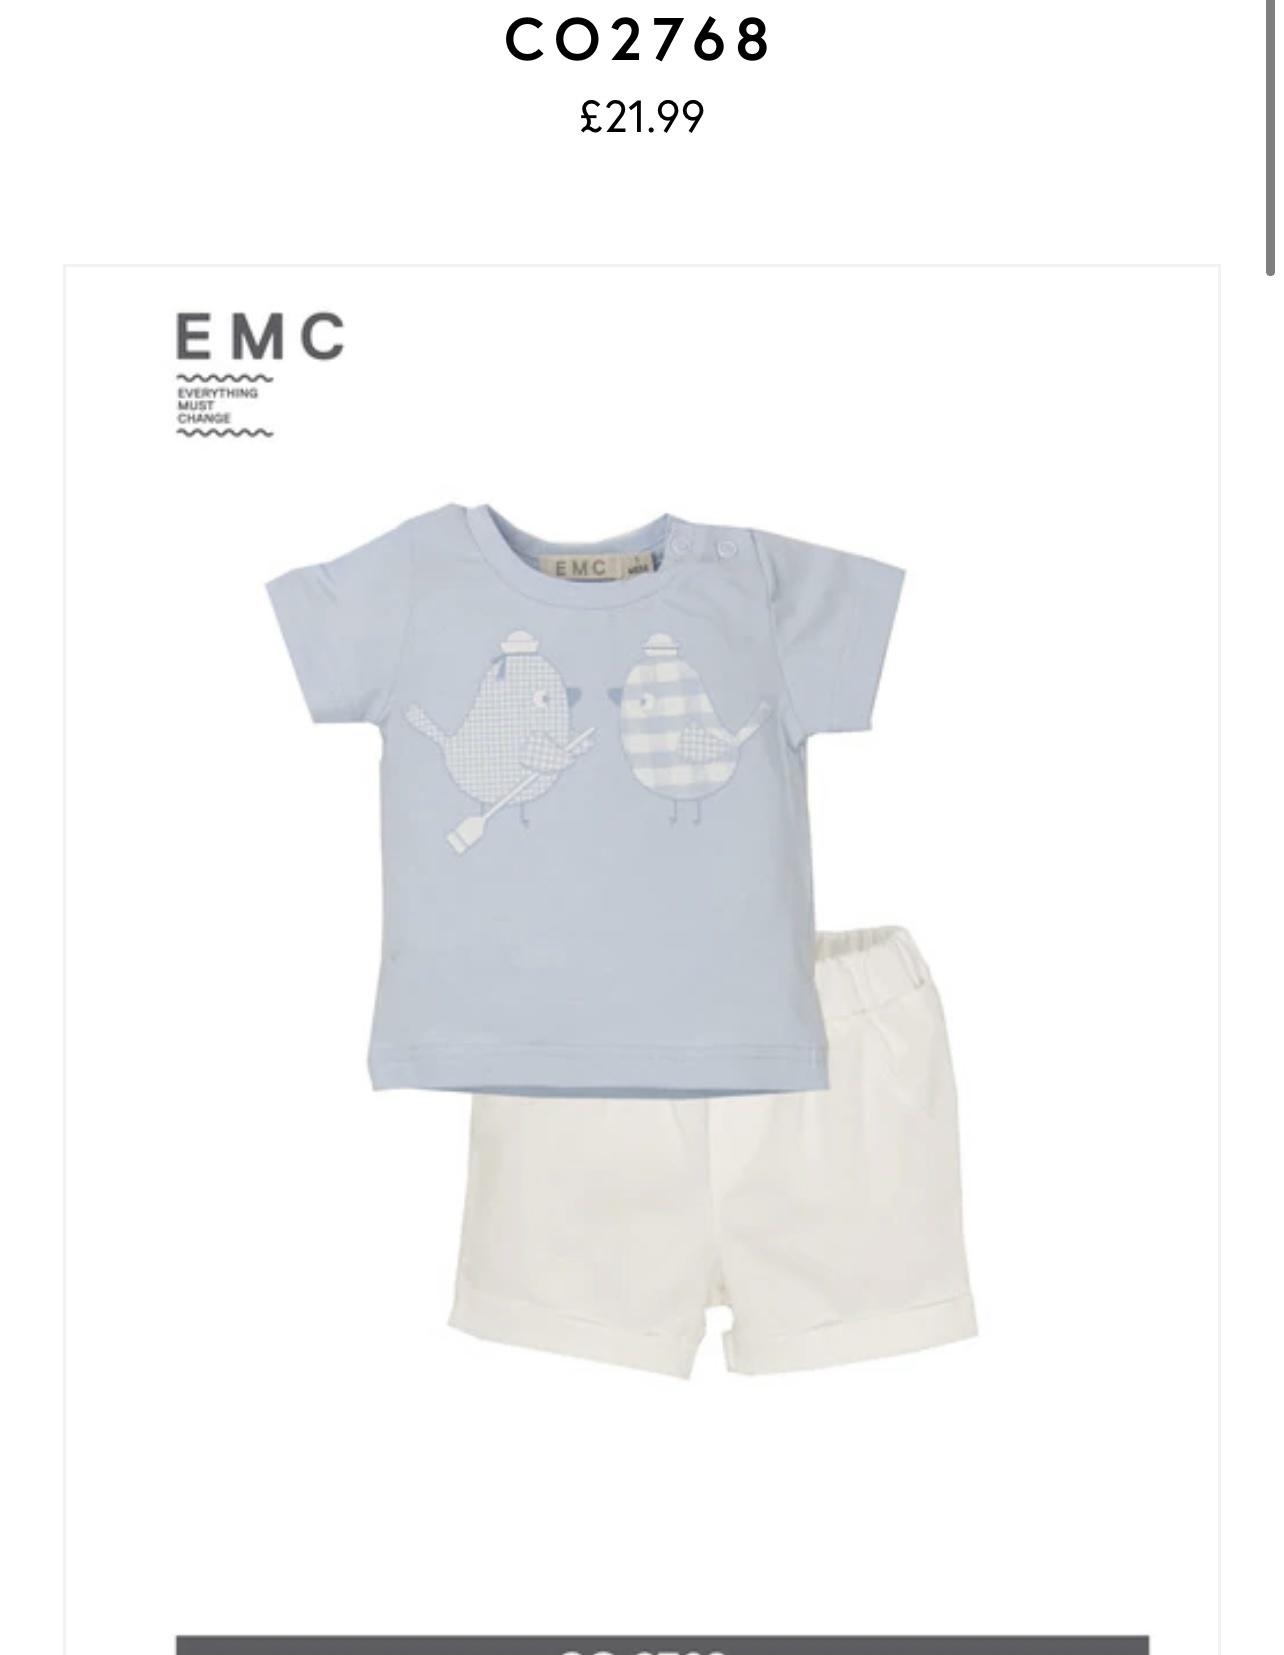 EMC EMC - BLUE SHORT SET - CO2768 S21